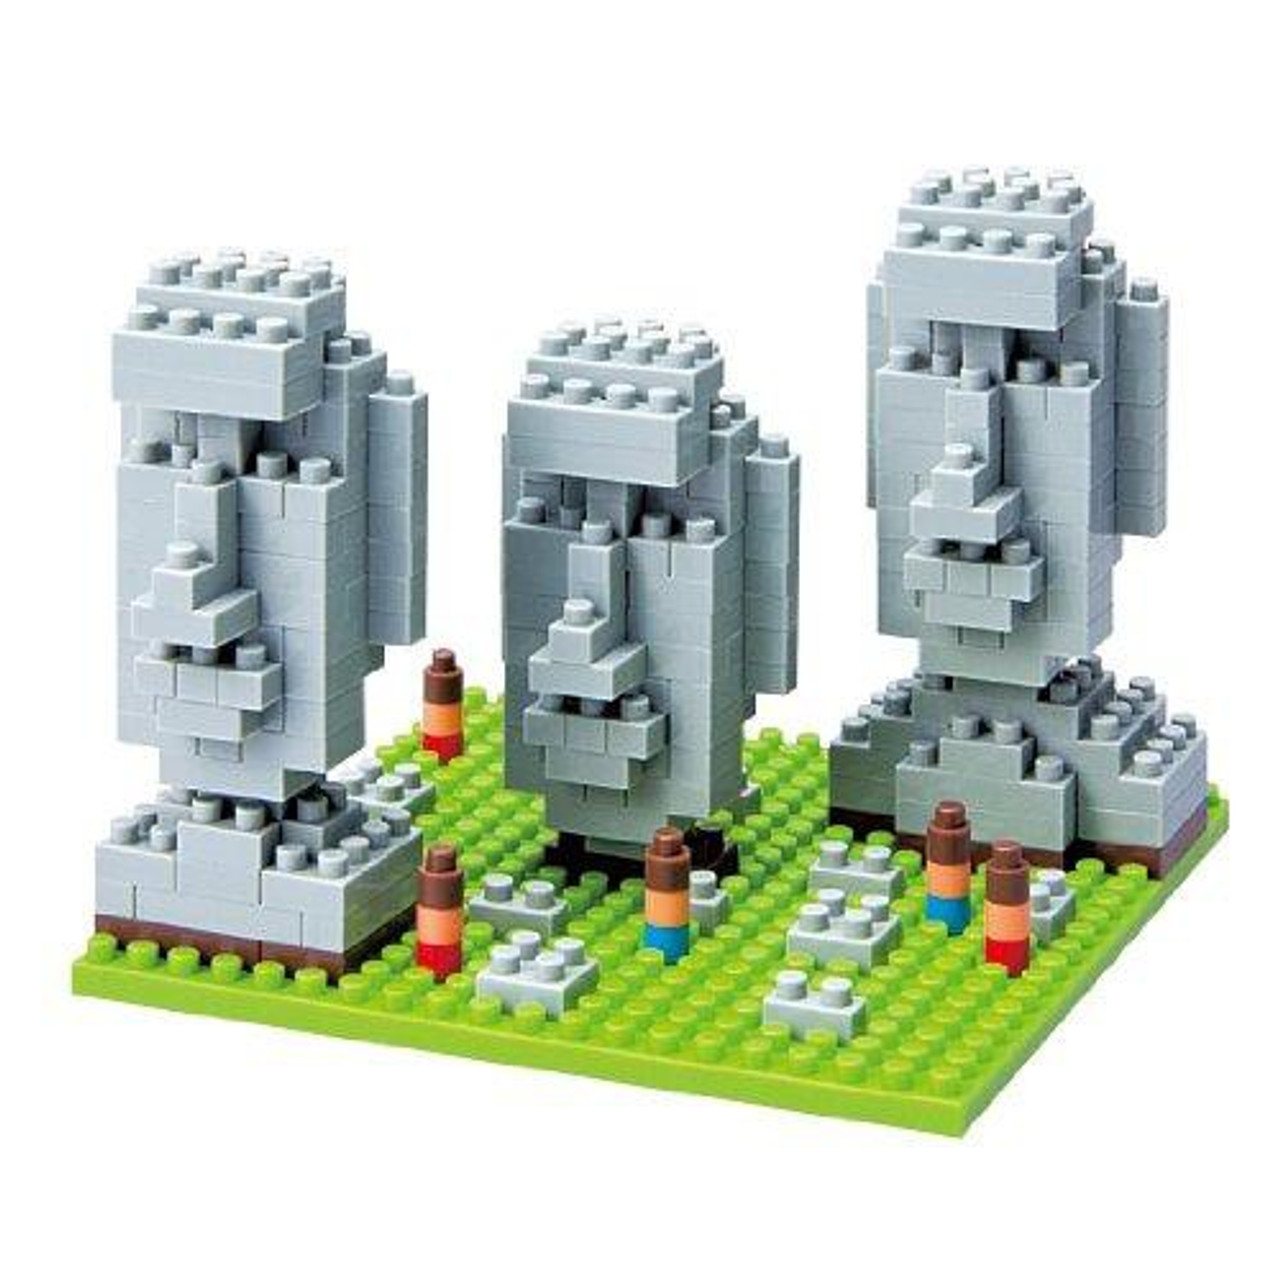 Nanoblock Micro-Sized Building Block Moai Statues on Easter Island Figure Set